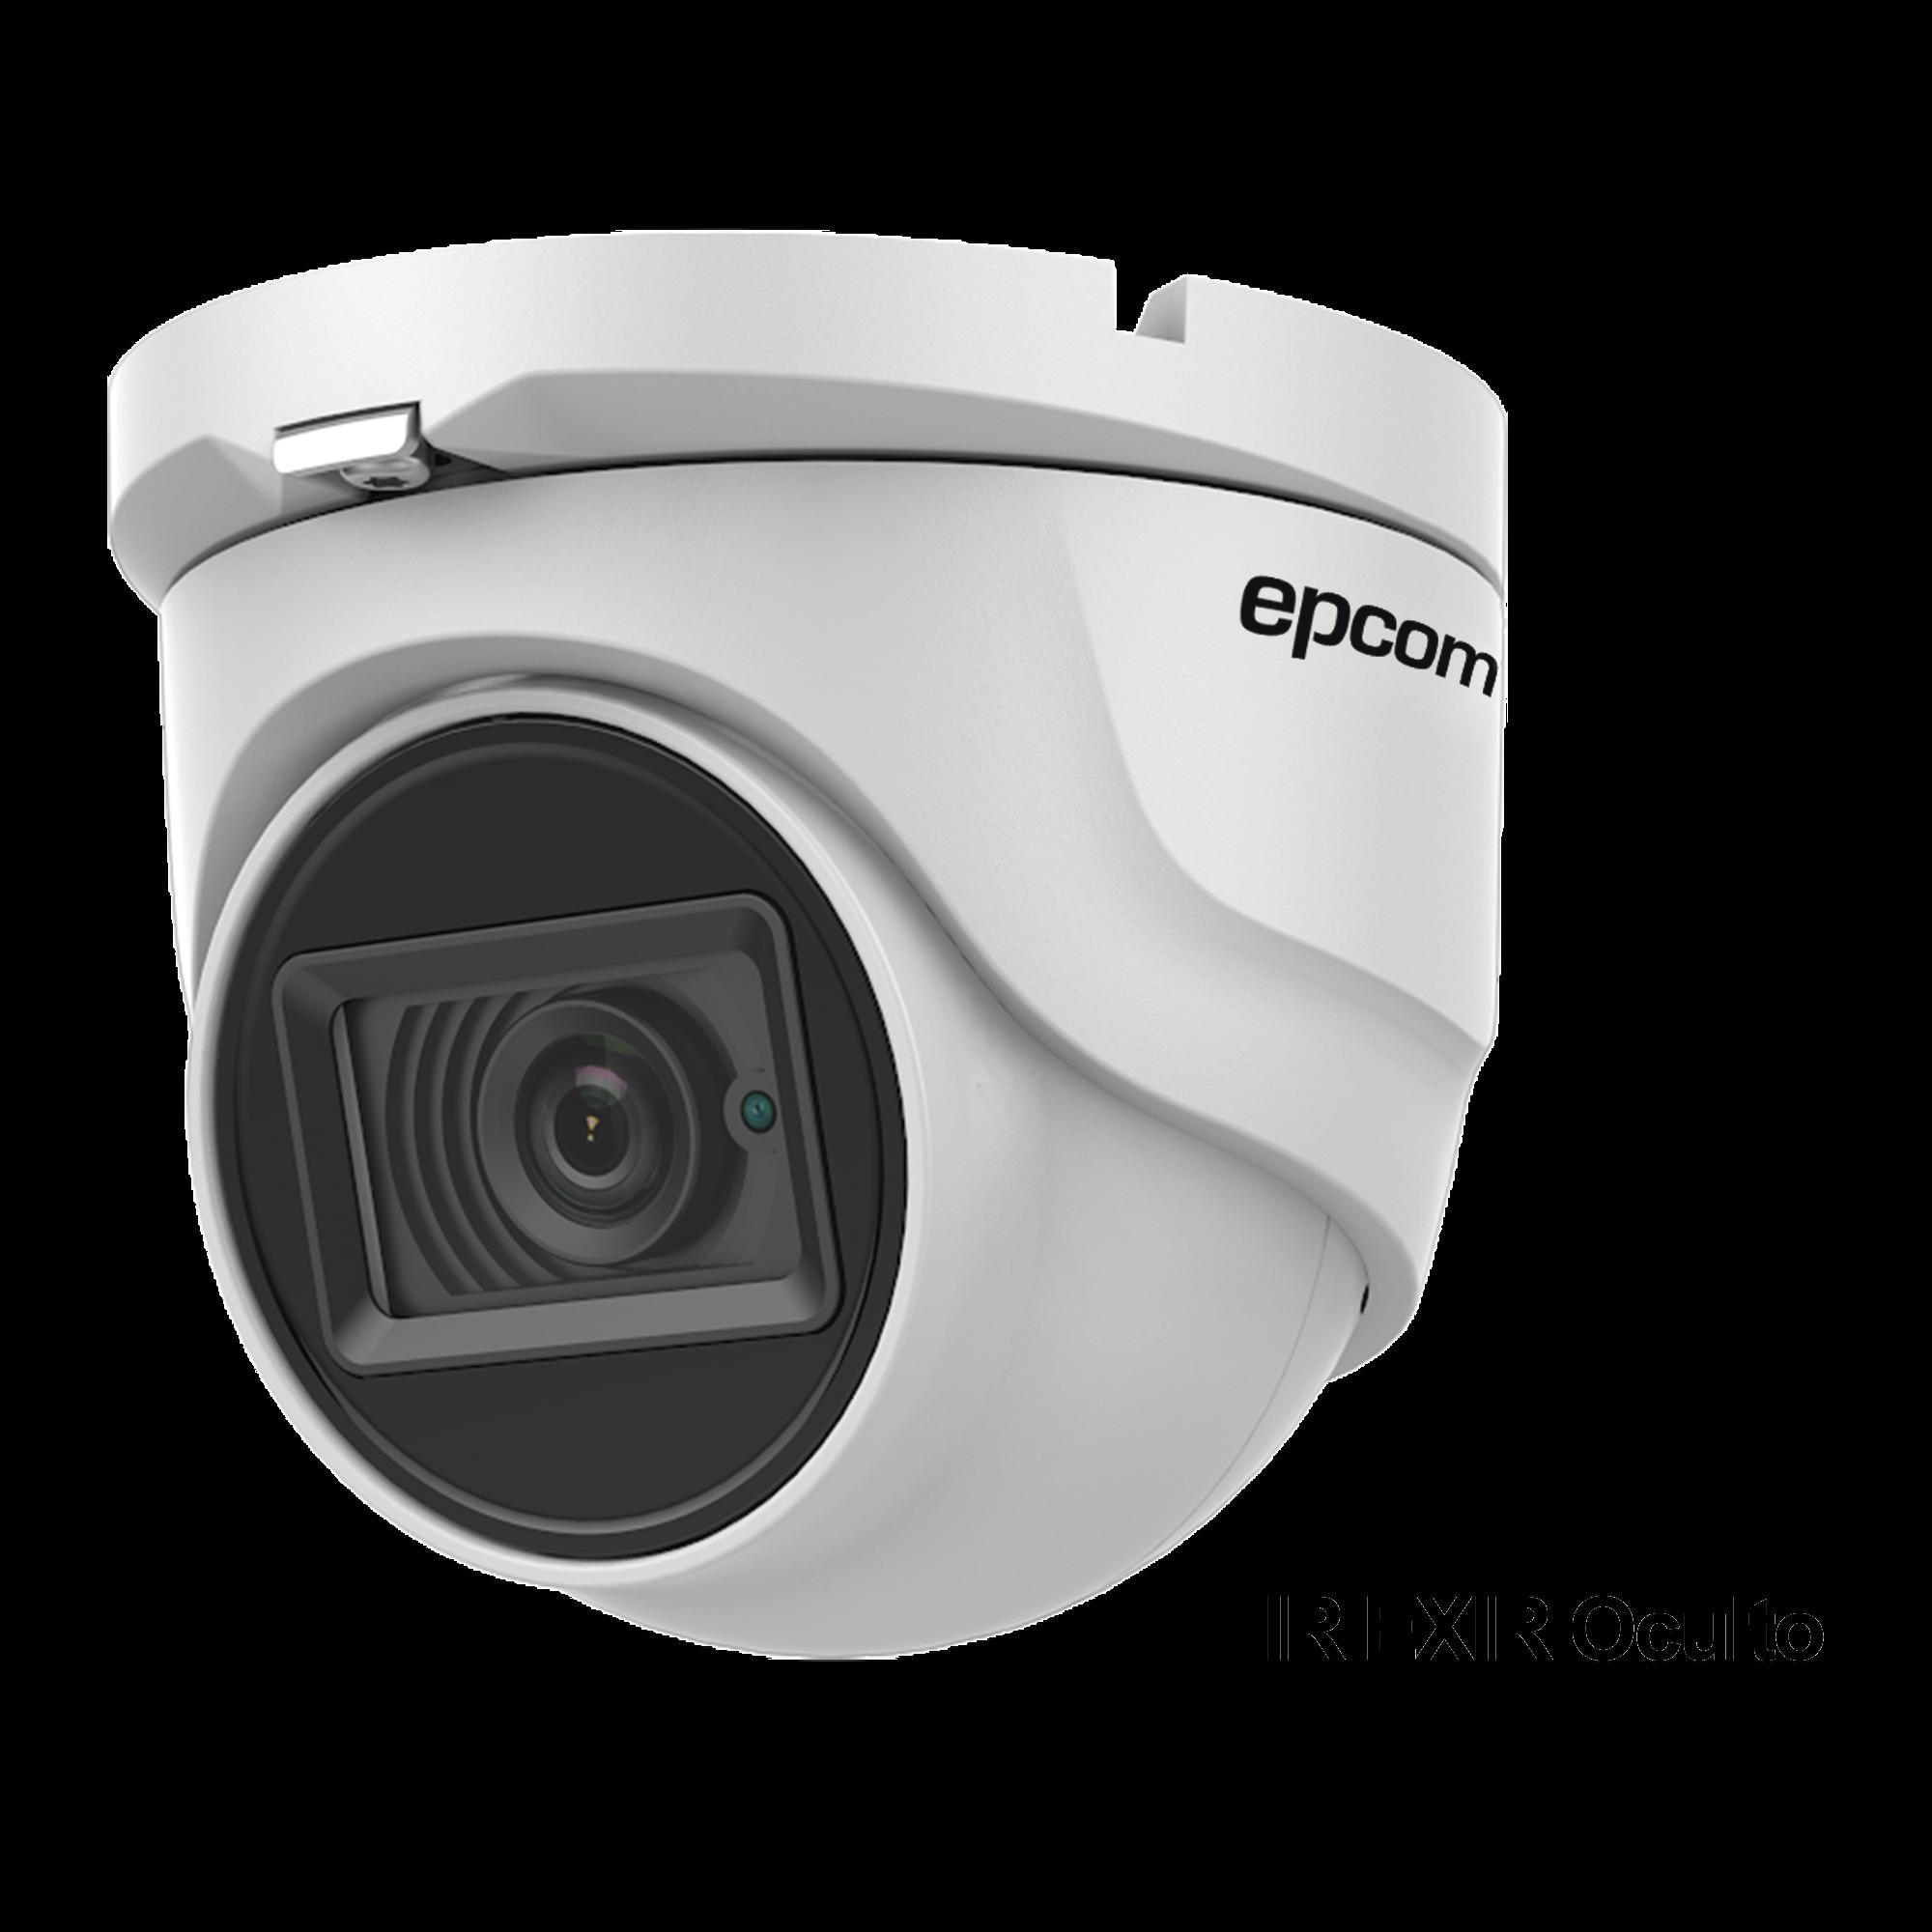 Eyeball TURBOHD 4K (8Megapixeles) / Gran Angular 102? / Lente 2.8 mm / Exterior IP67/ IR EXIR 30 mts / dWDR / TVI-AHD-CVI-CVBS